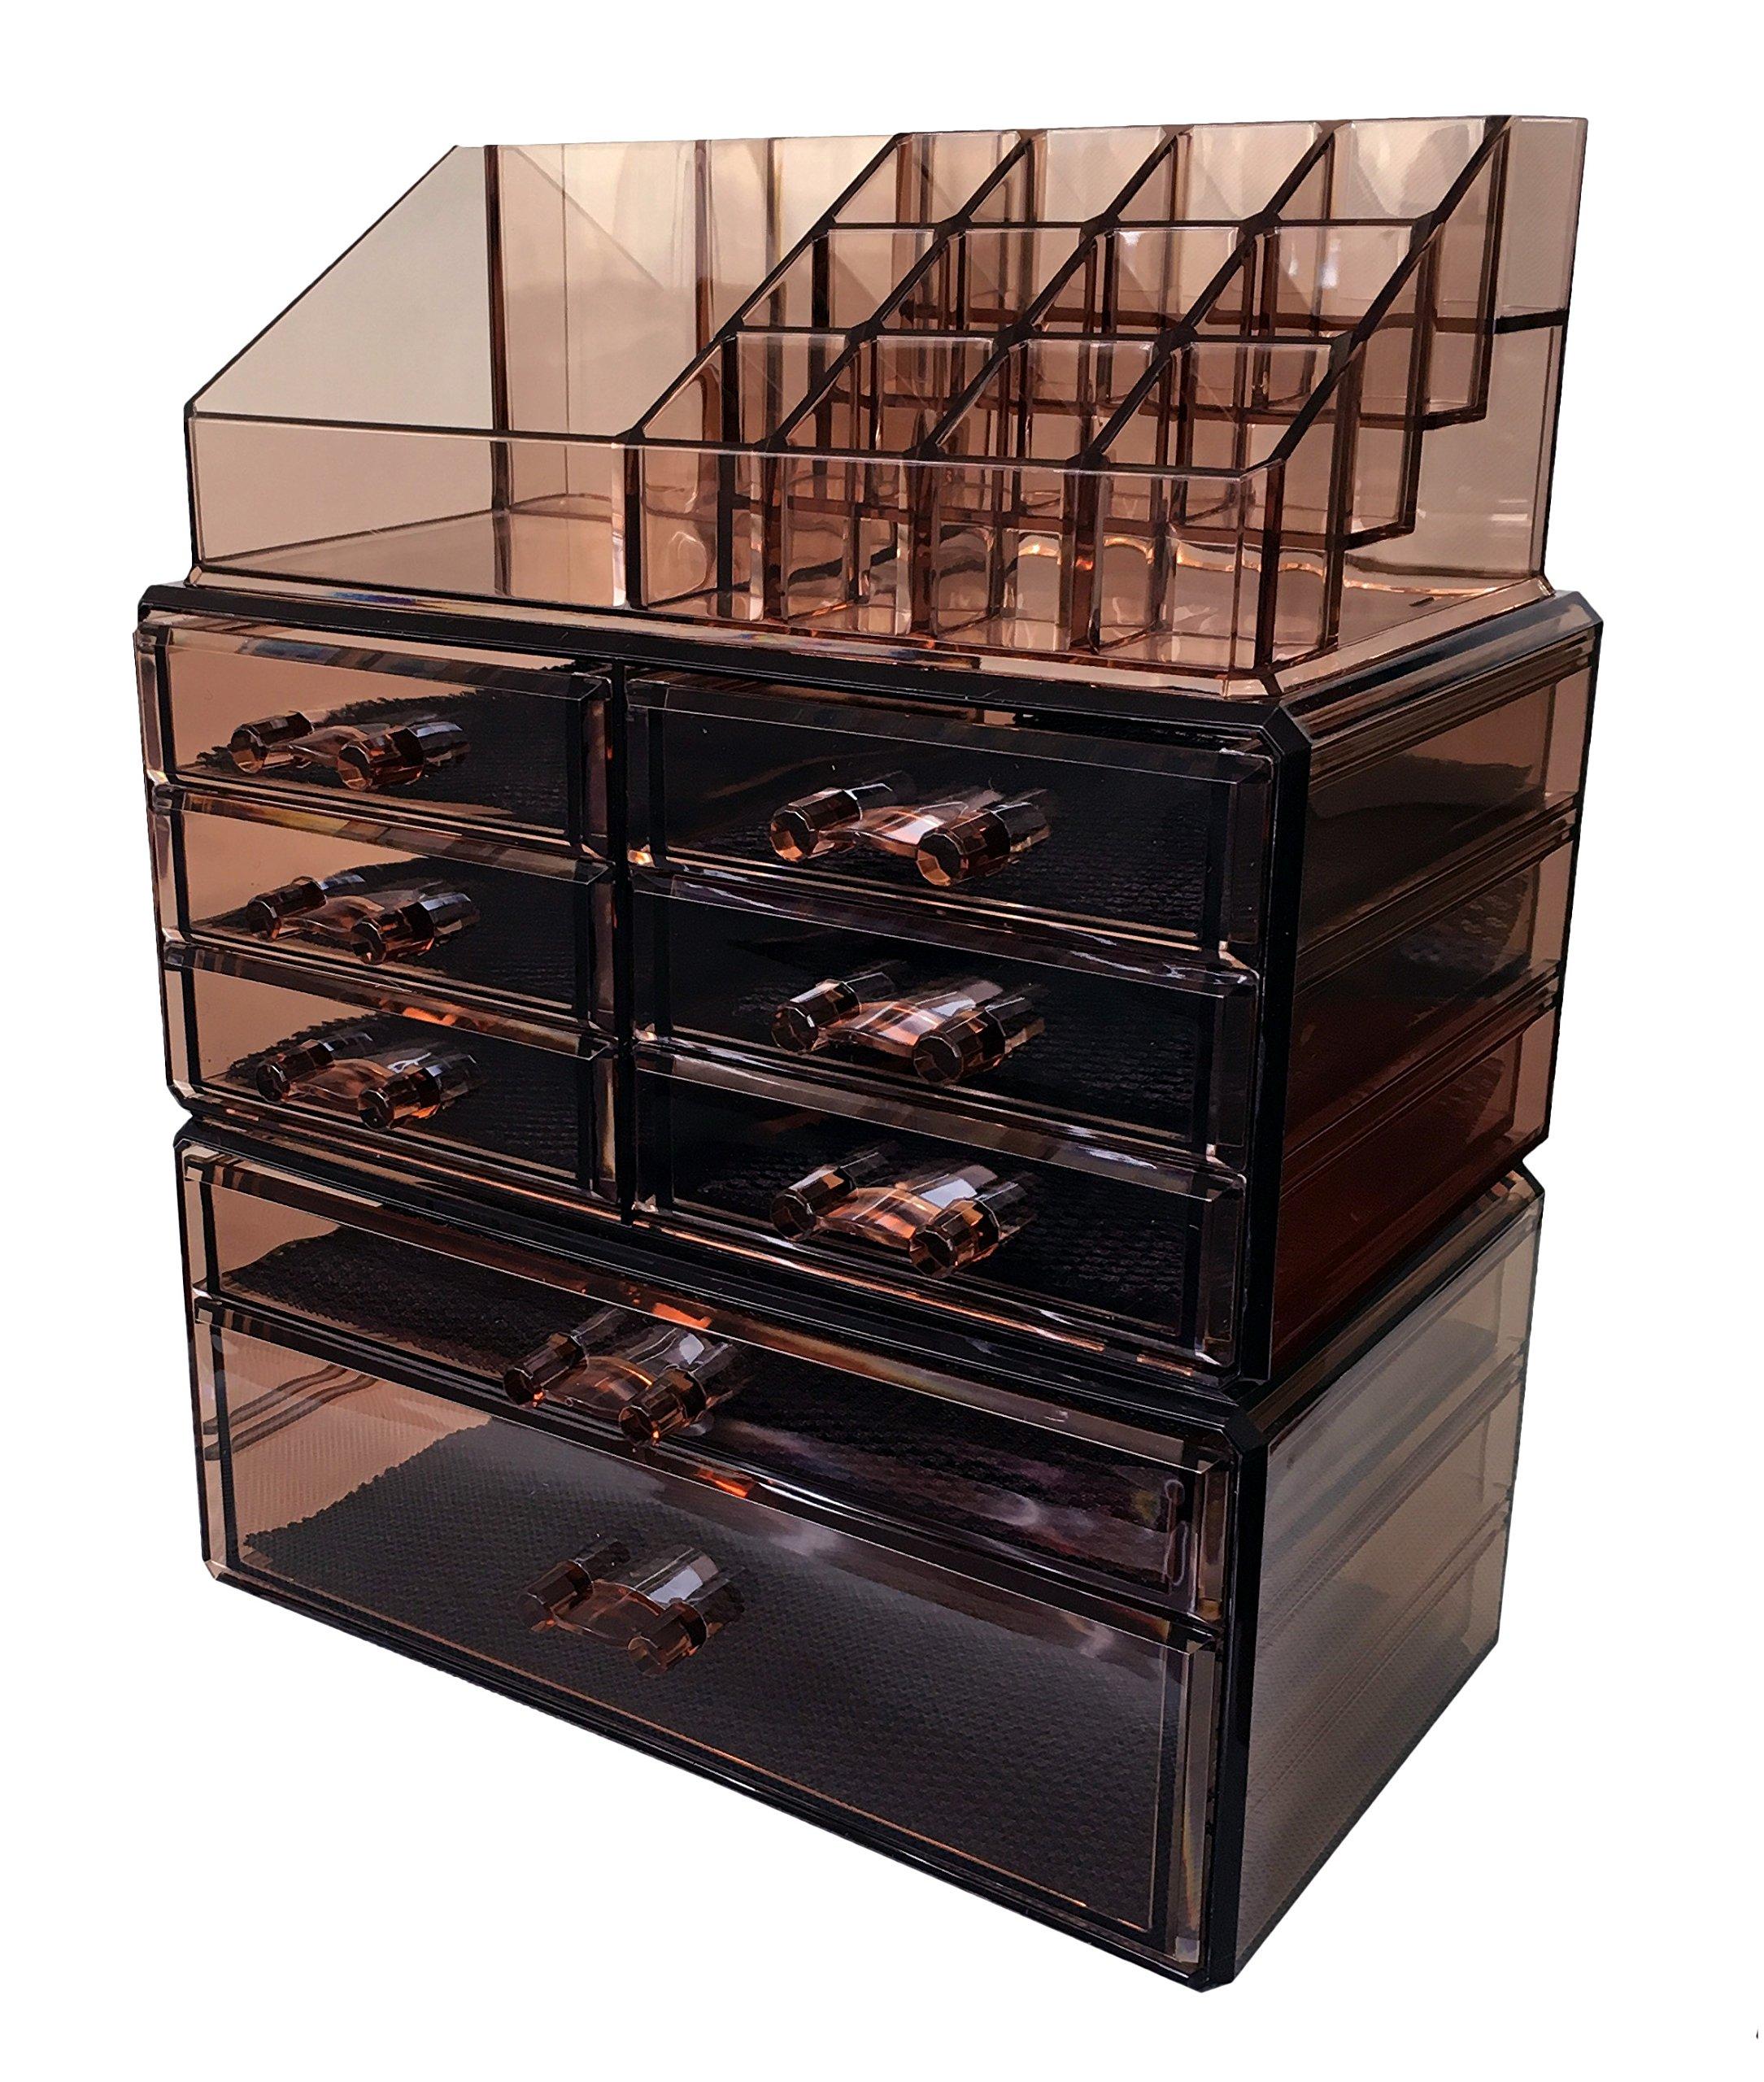 Sodynee Acrylic Makeup Cosmetic Organizer Storage Drawers